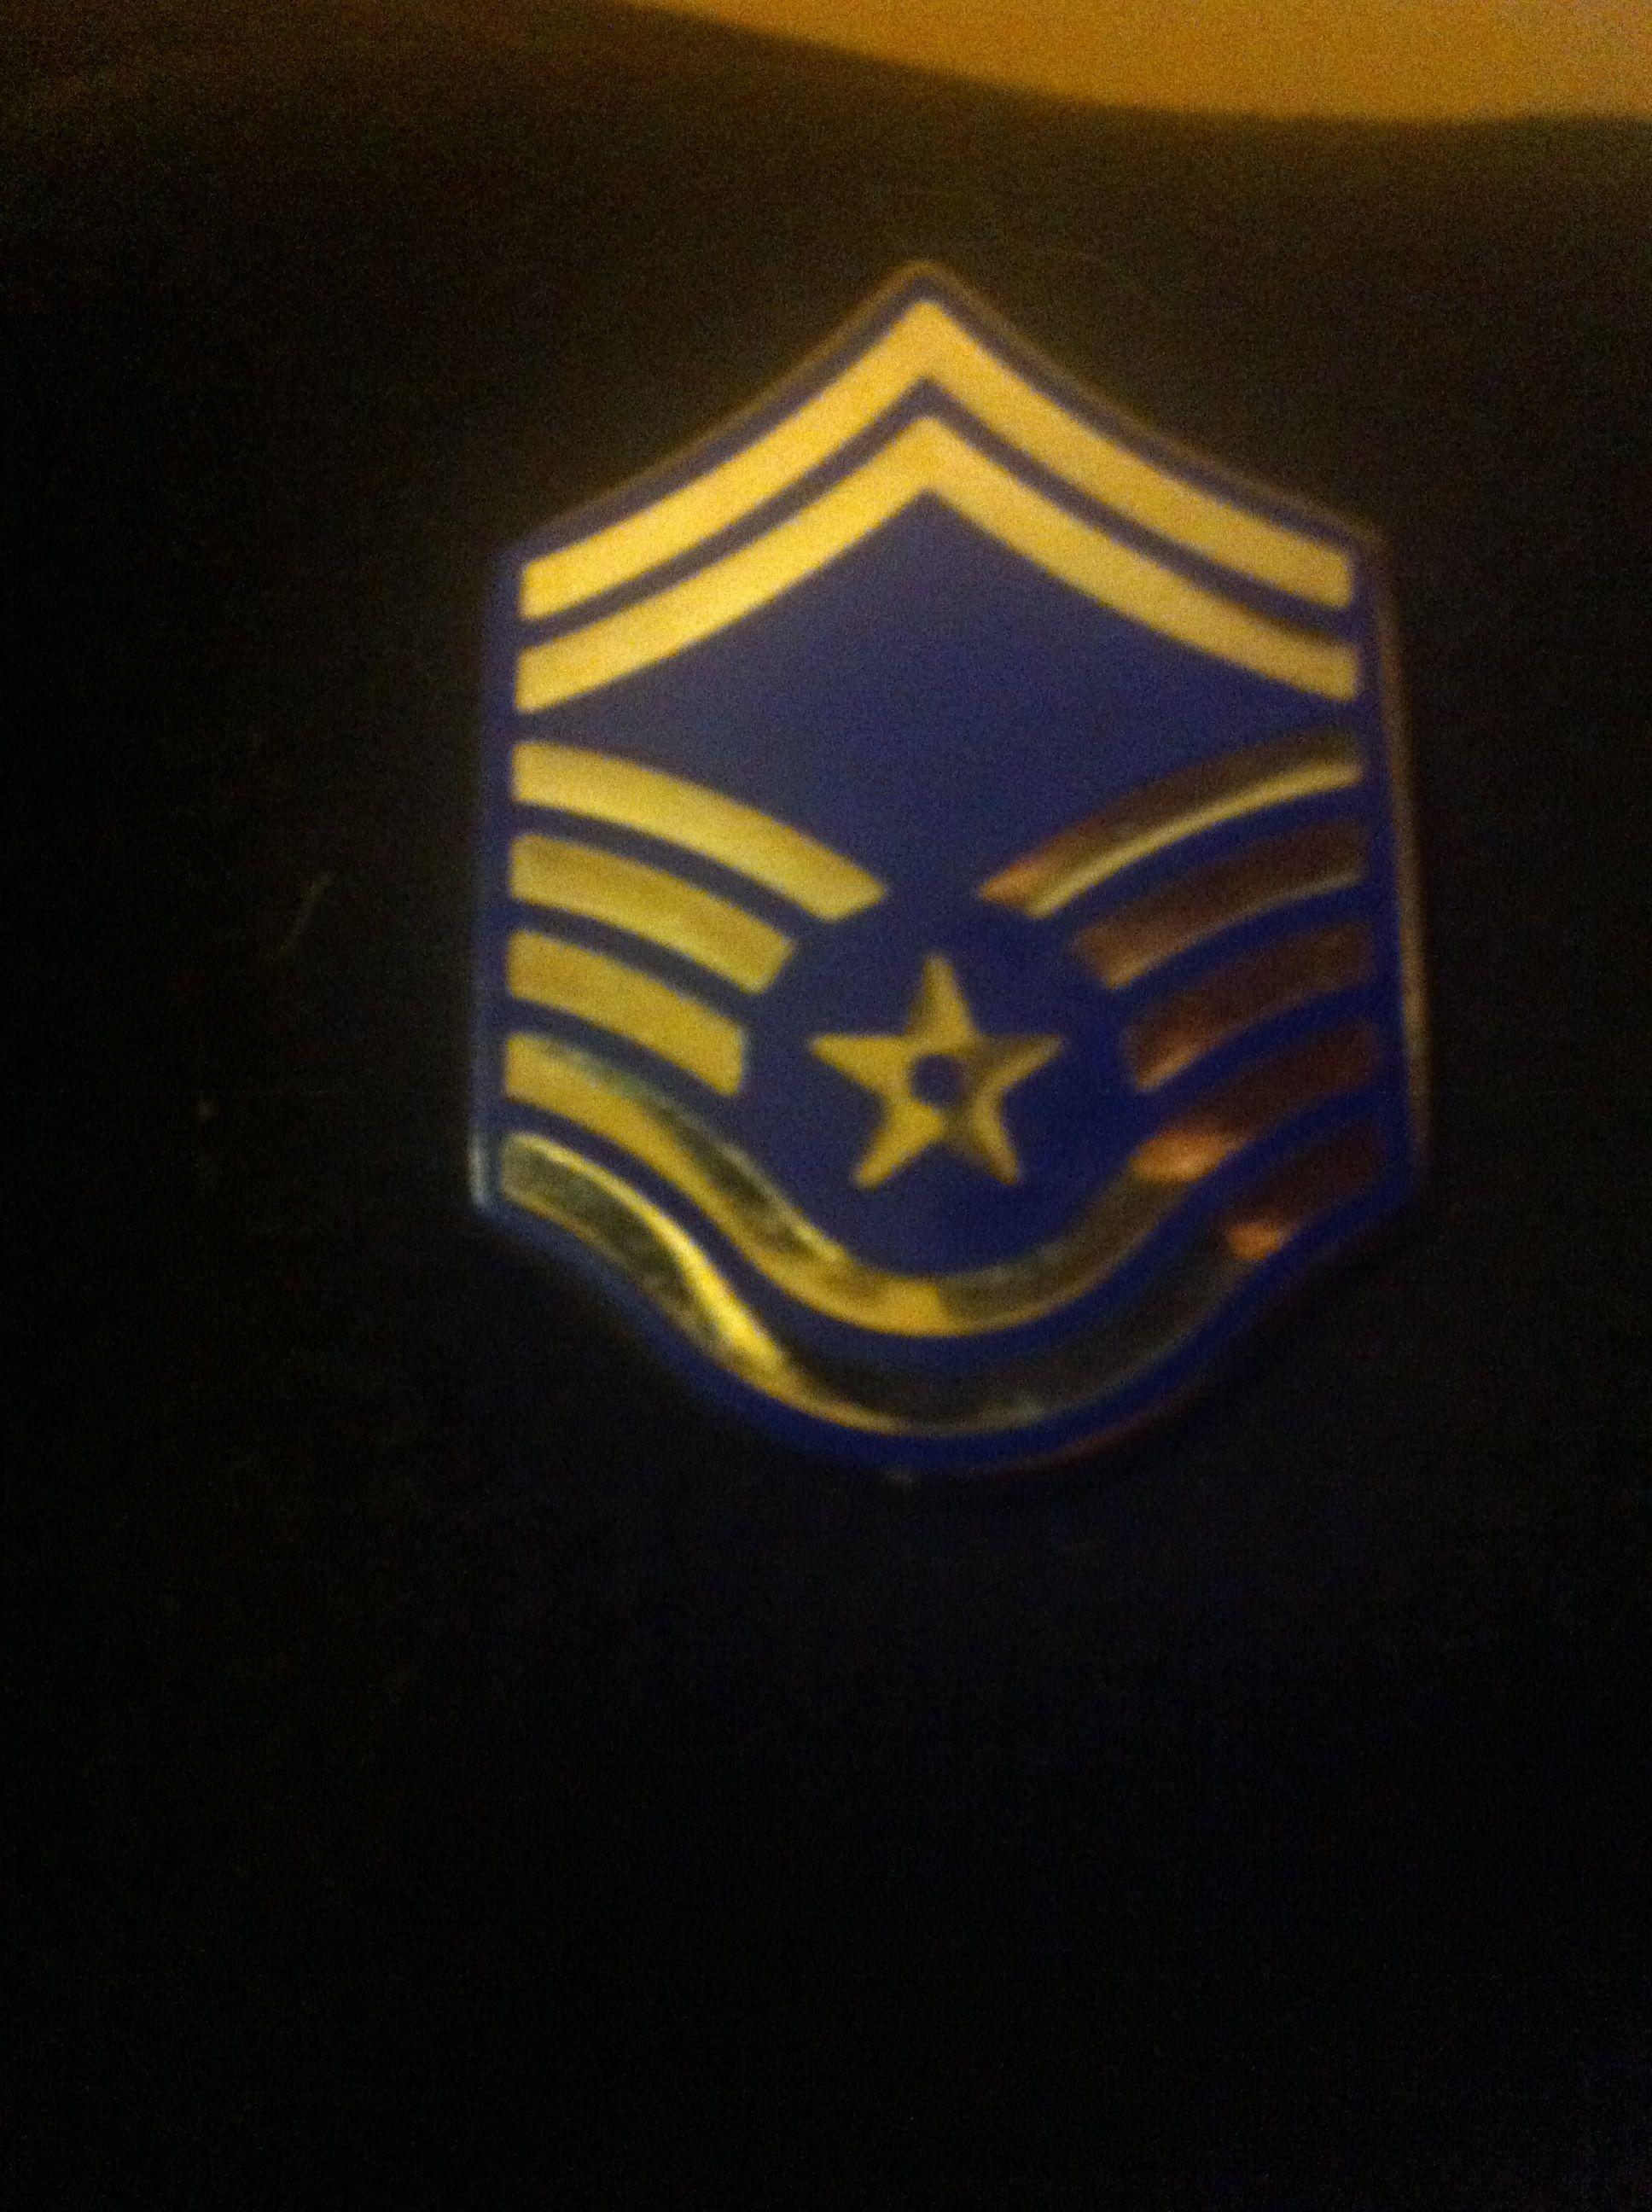 Air Force rank insignia, E8, Senior Master Sergeant